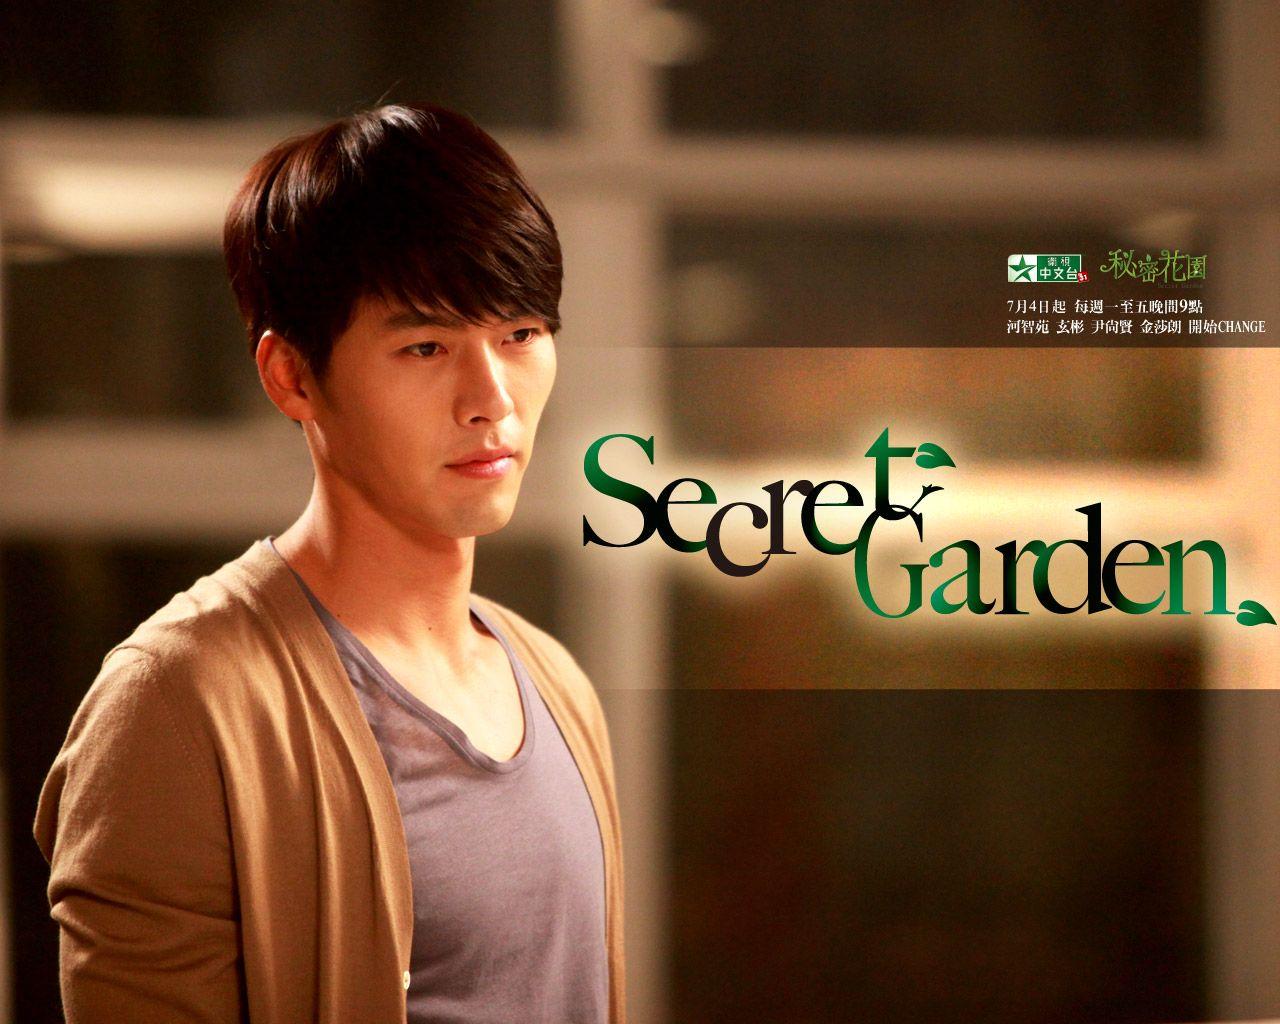 secret garden - Secret Garden Korean Drama (SG Lovers) Photo ...